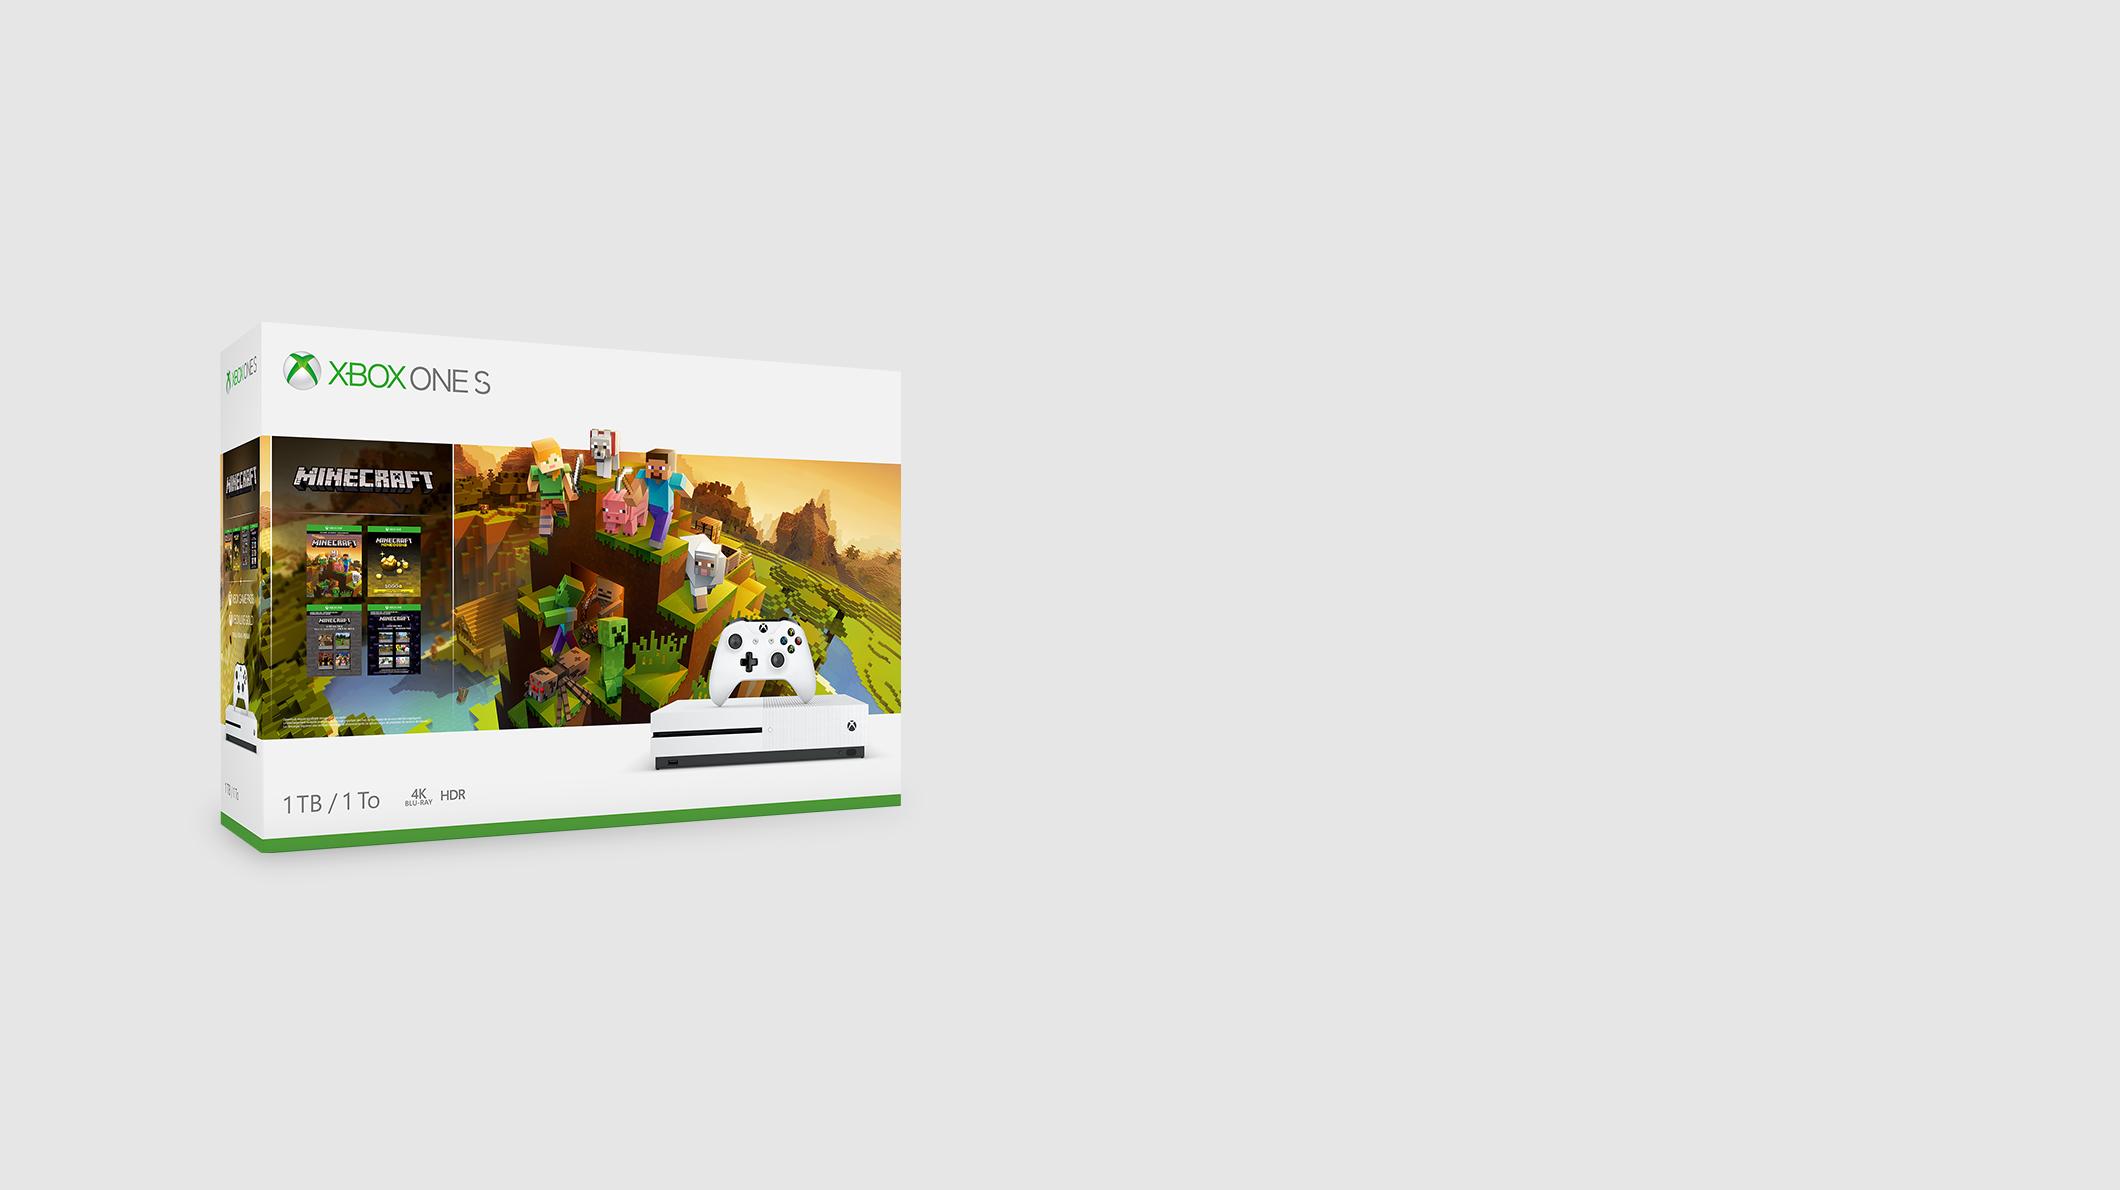 Xbox One S - Minecraft